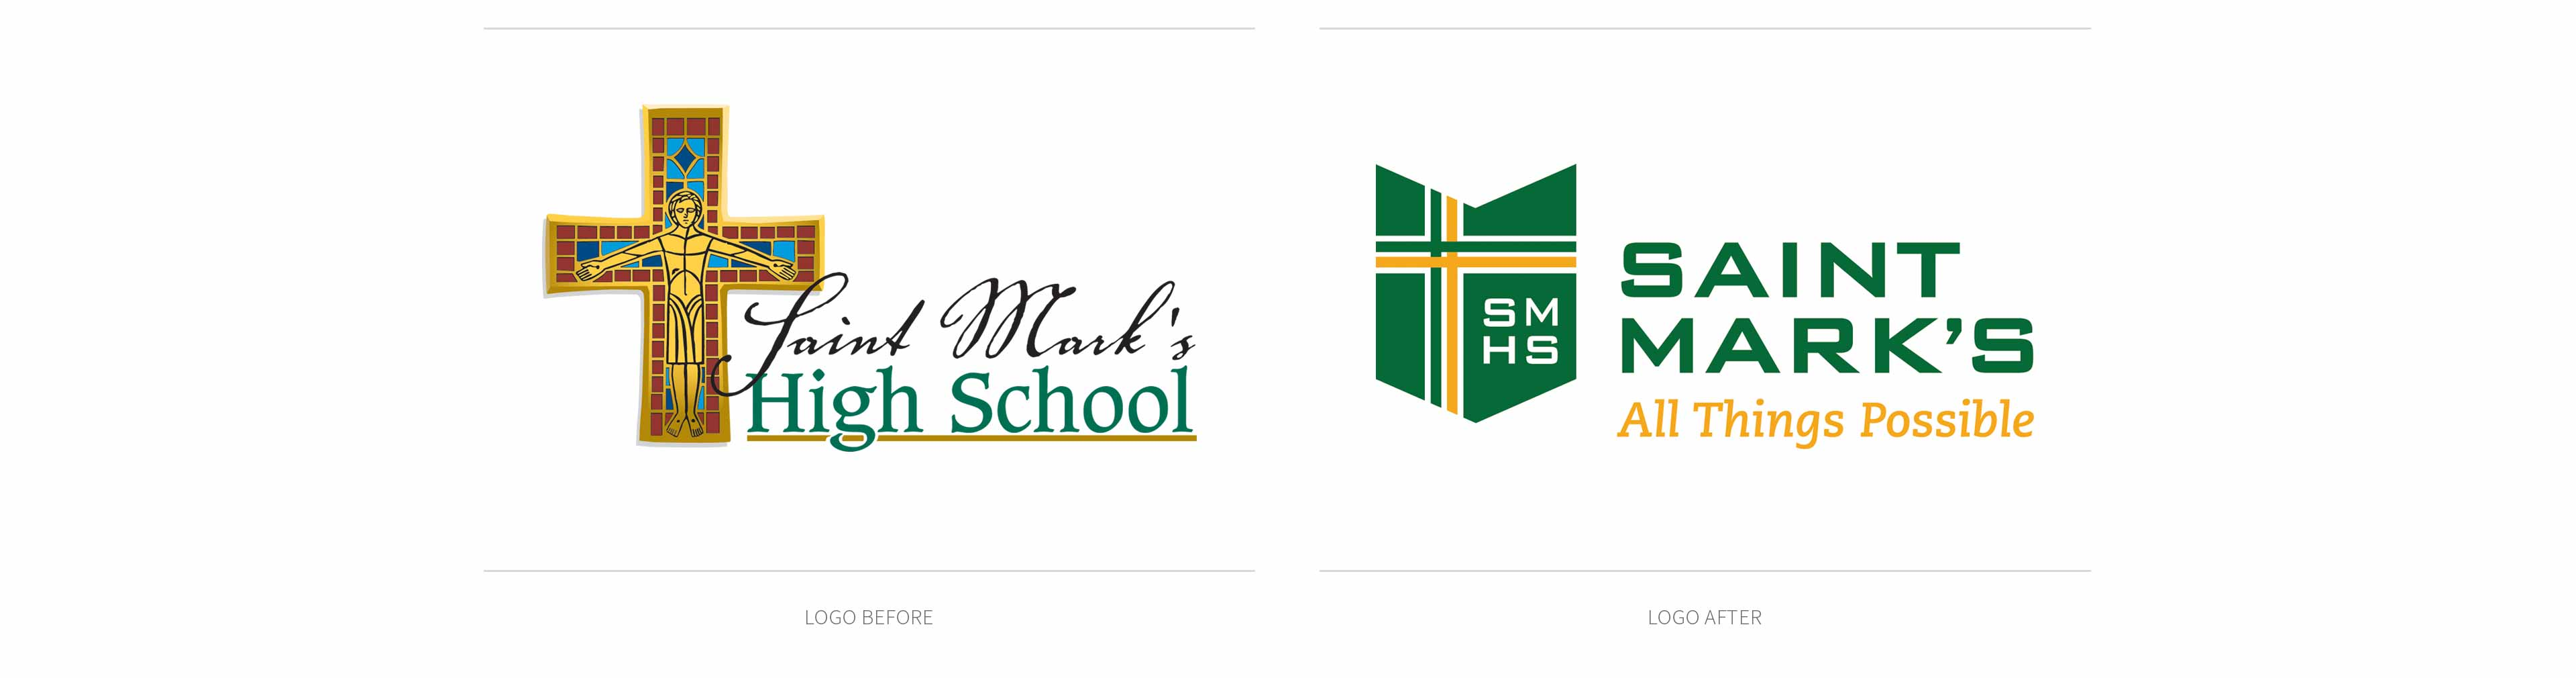 Catholic diocesan school logo